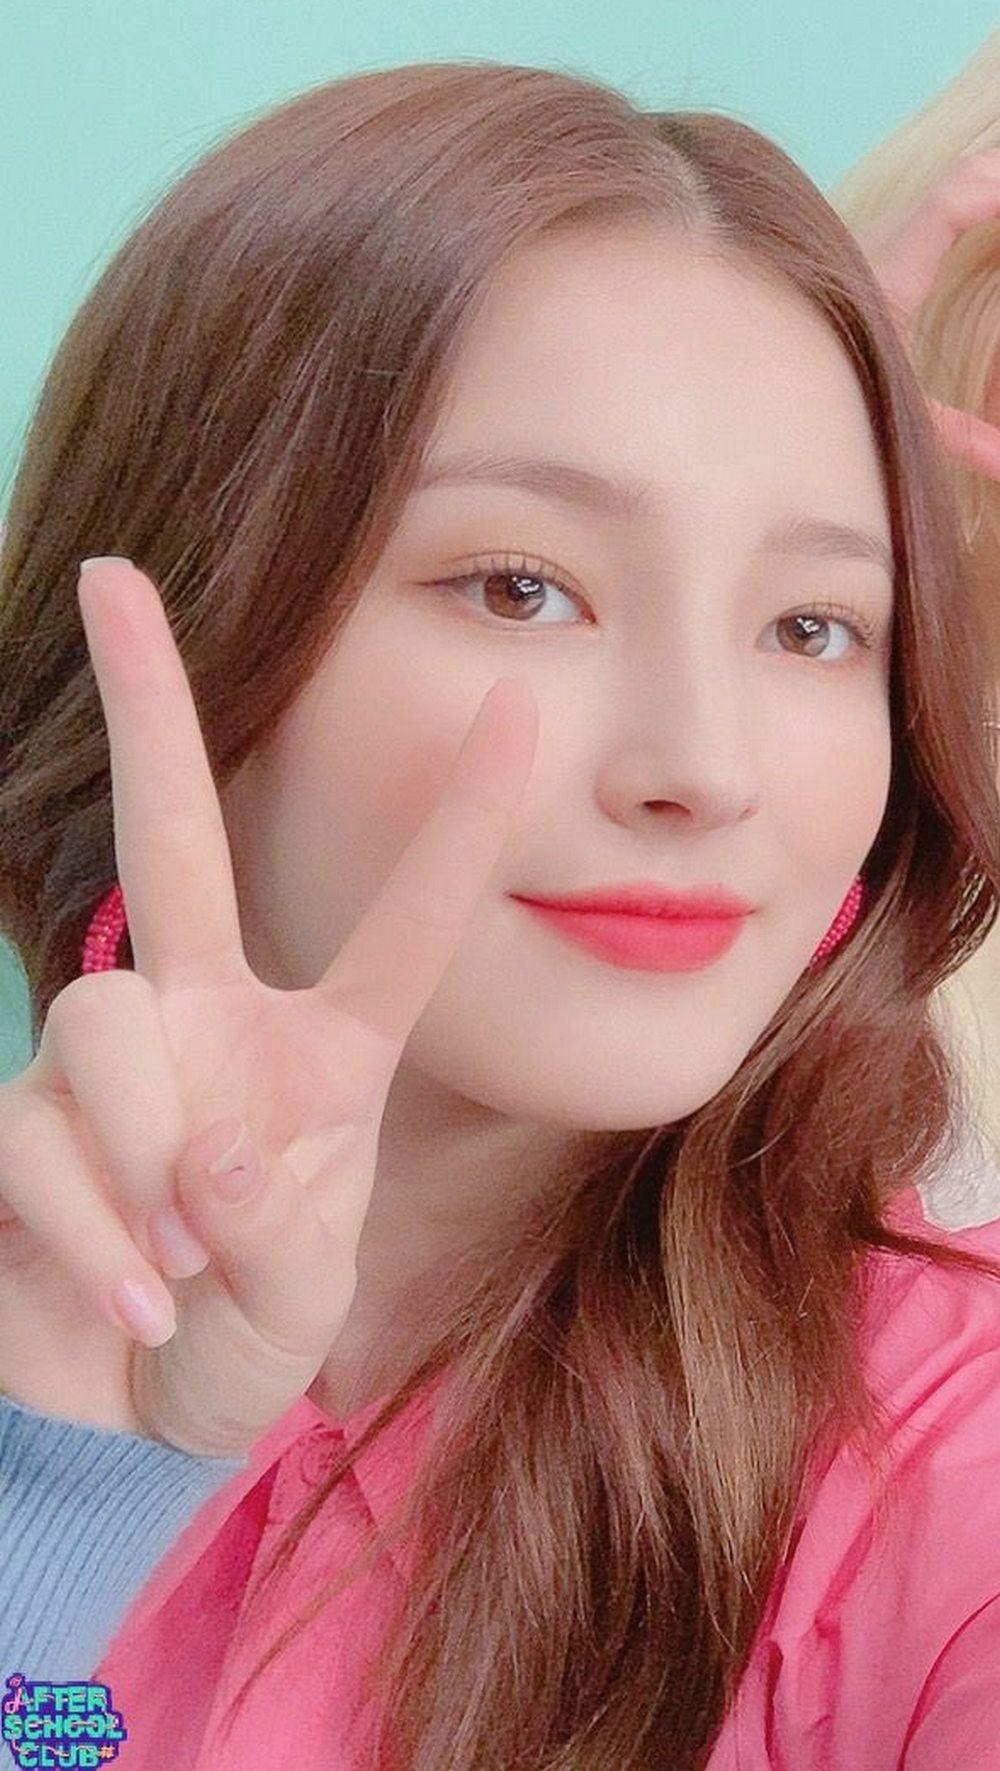 Pin by sizzy on nancy jewel mcdonie korean beauty girls